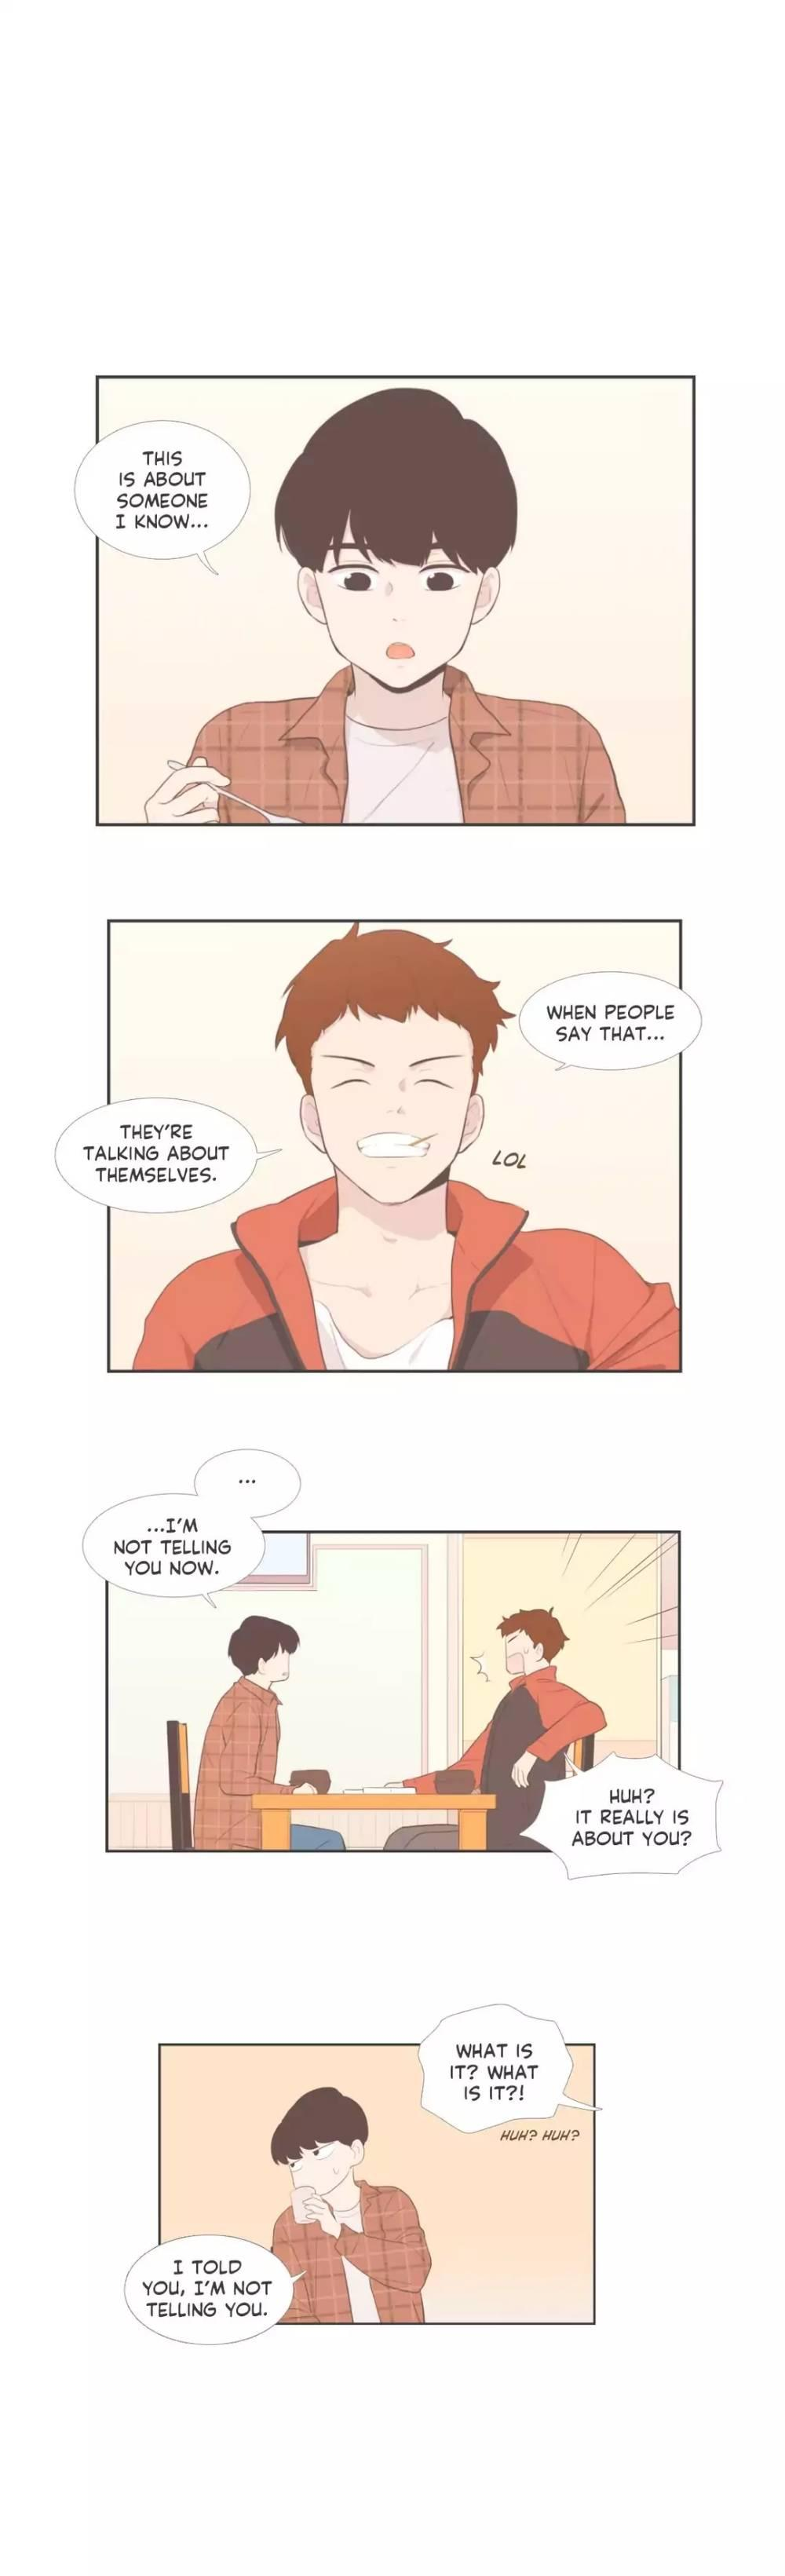 https://manga.mangadogs.com/comics/pic3/17/337/1414742/eebaf35cd01e754f8148941800d63ffe.jpg Page 1